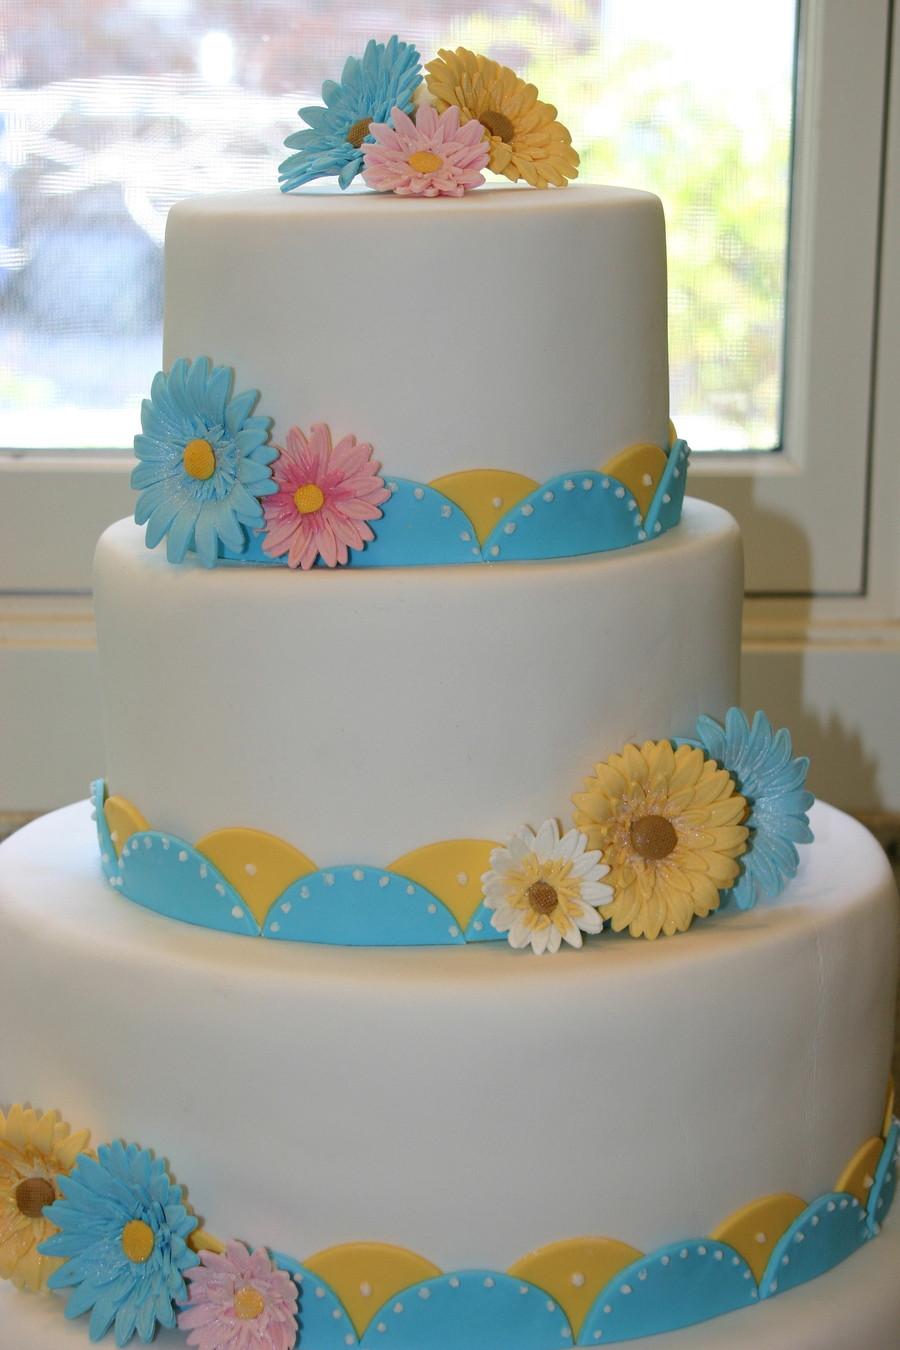 Daisy Wedding Cakes  Gerbera Daisy Wedding Cake CakeCentral